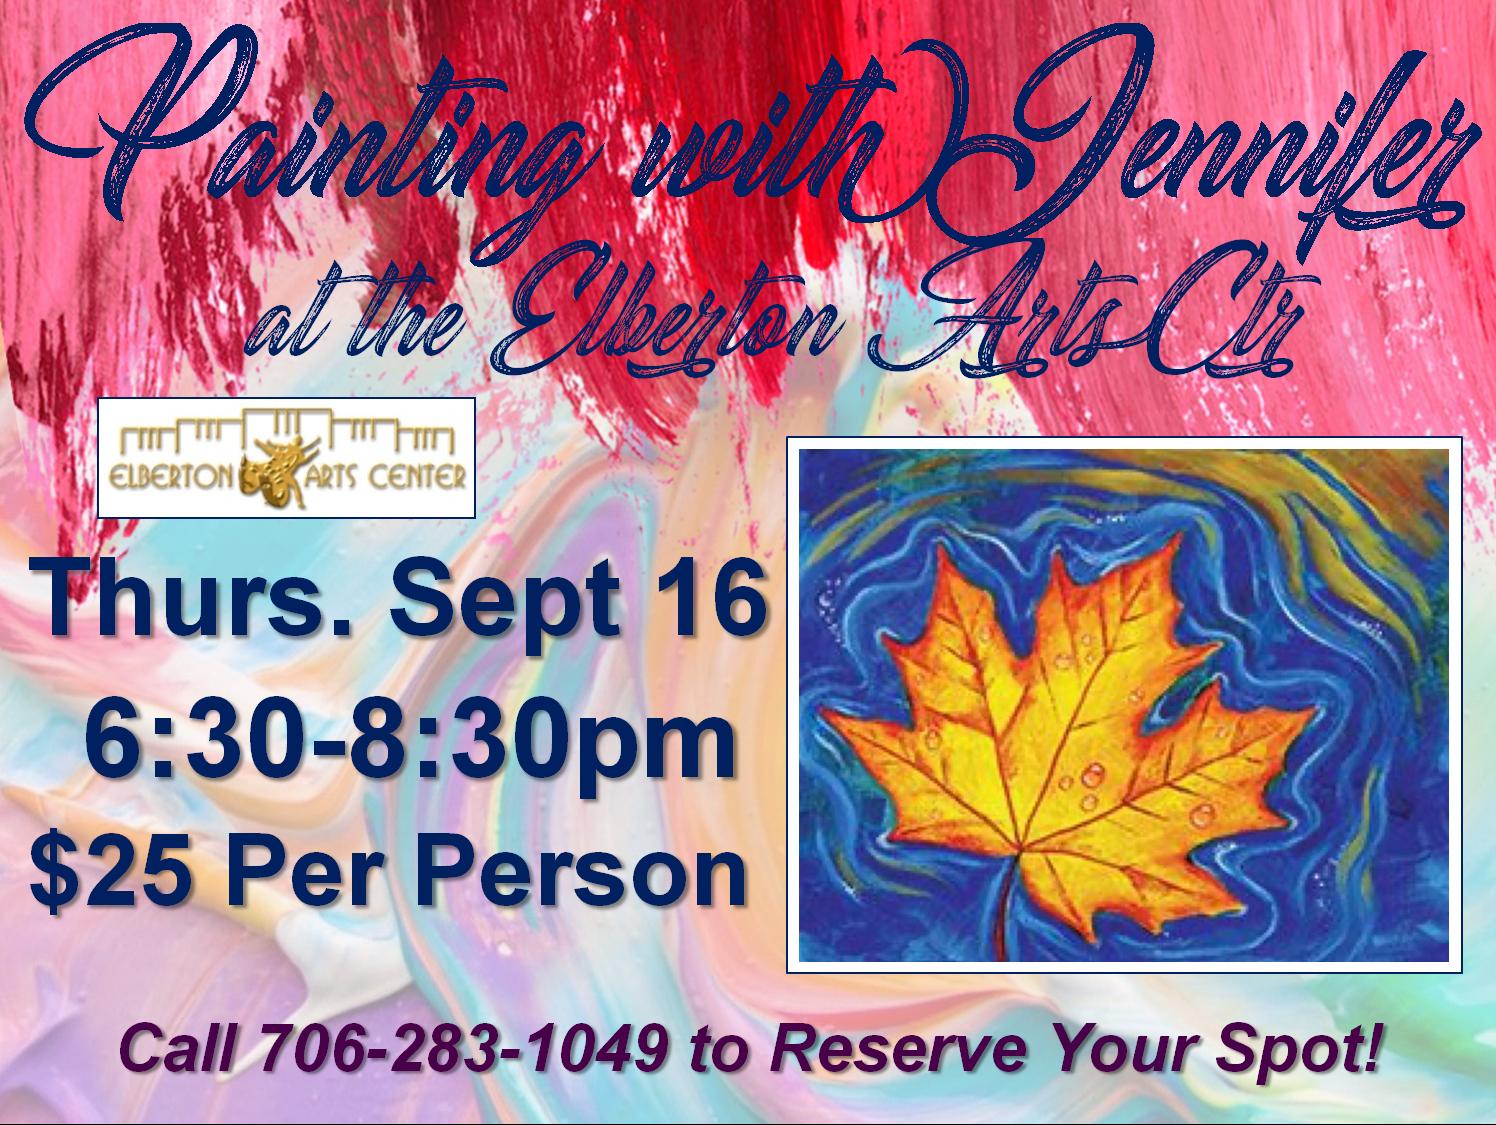 Painting with Jennifer Thurs Sept 16